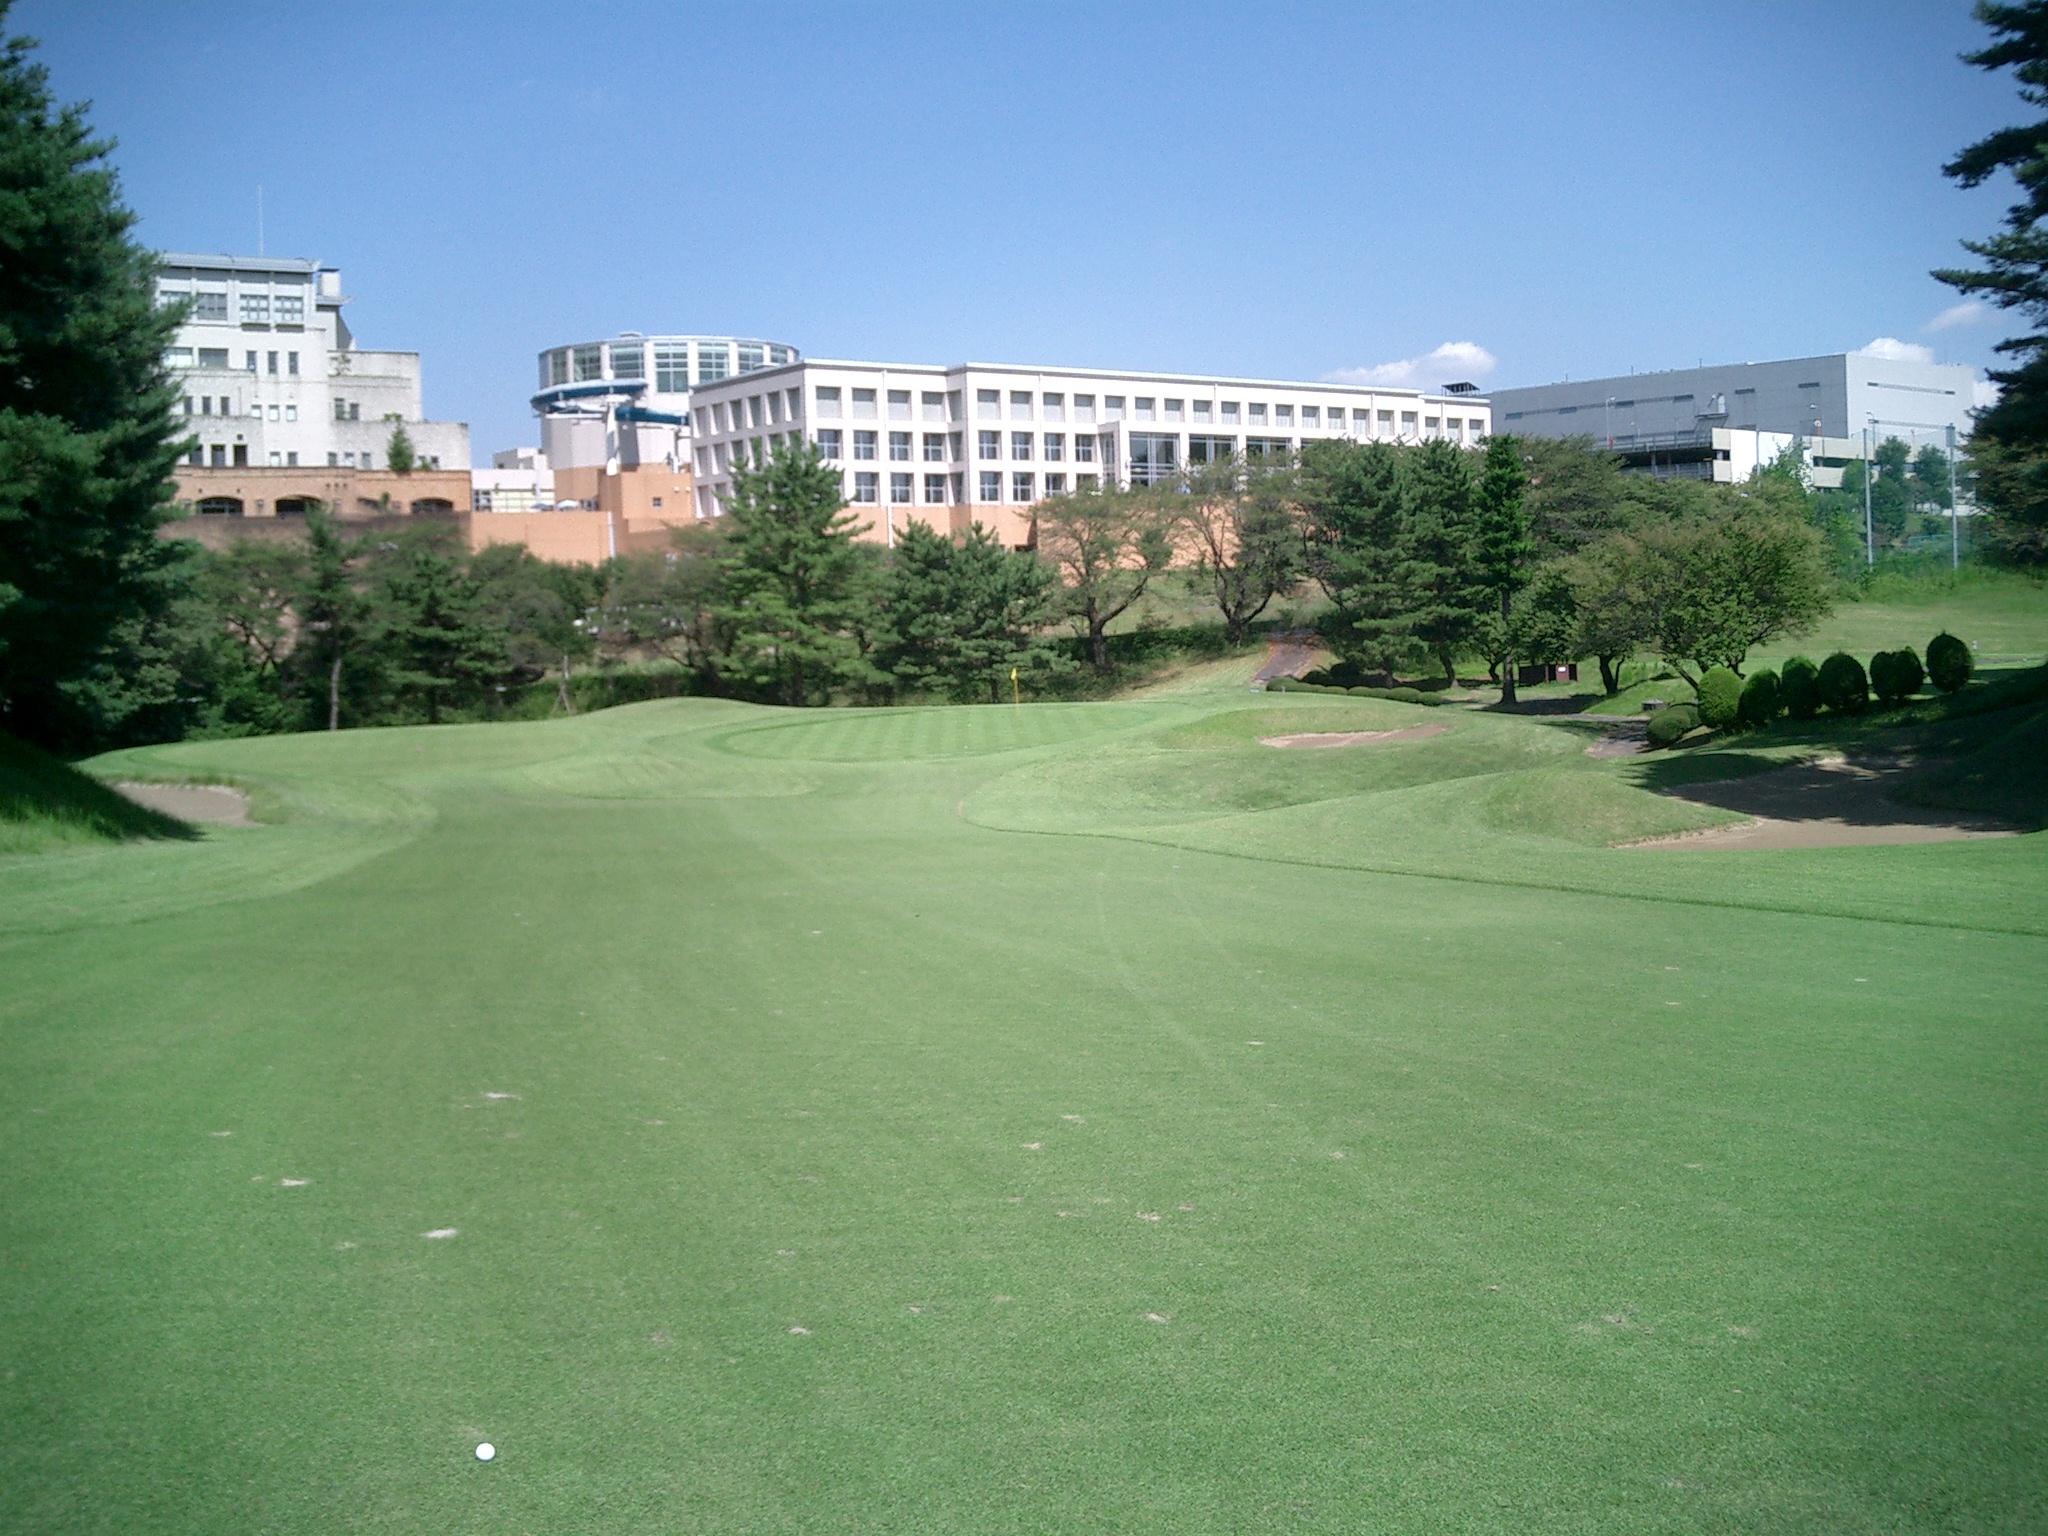 会員 倶楽部 権 東京 ゴルフ 国際